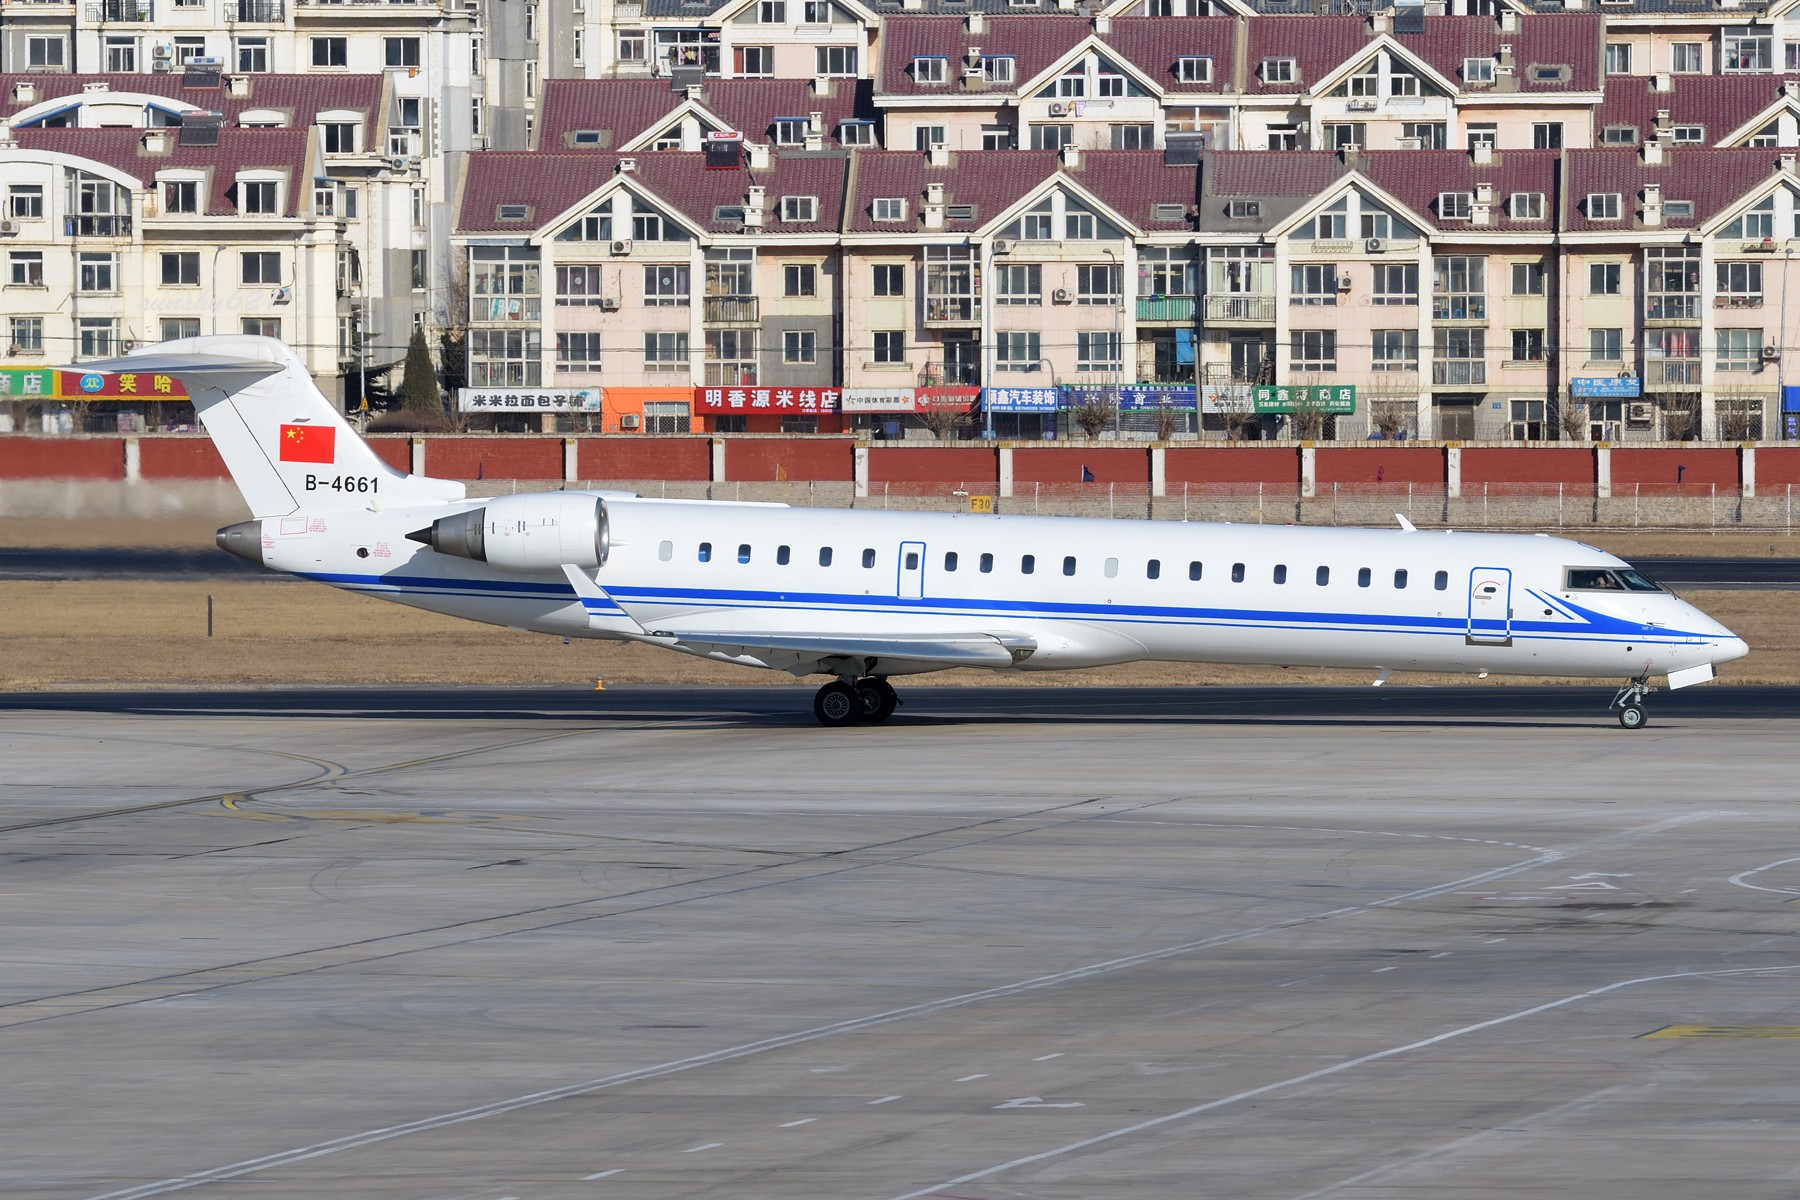 Re:[原创]★[DLC]一点有趣的事情(持续更新中)★ BOMBARDIER CRJ-700 B-4661 中国大连国际机场